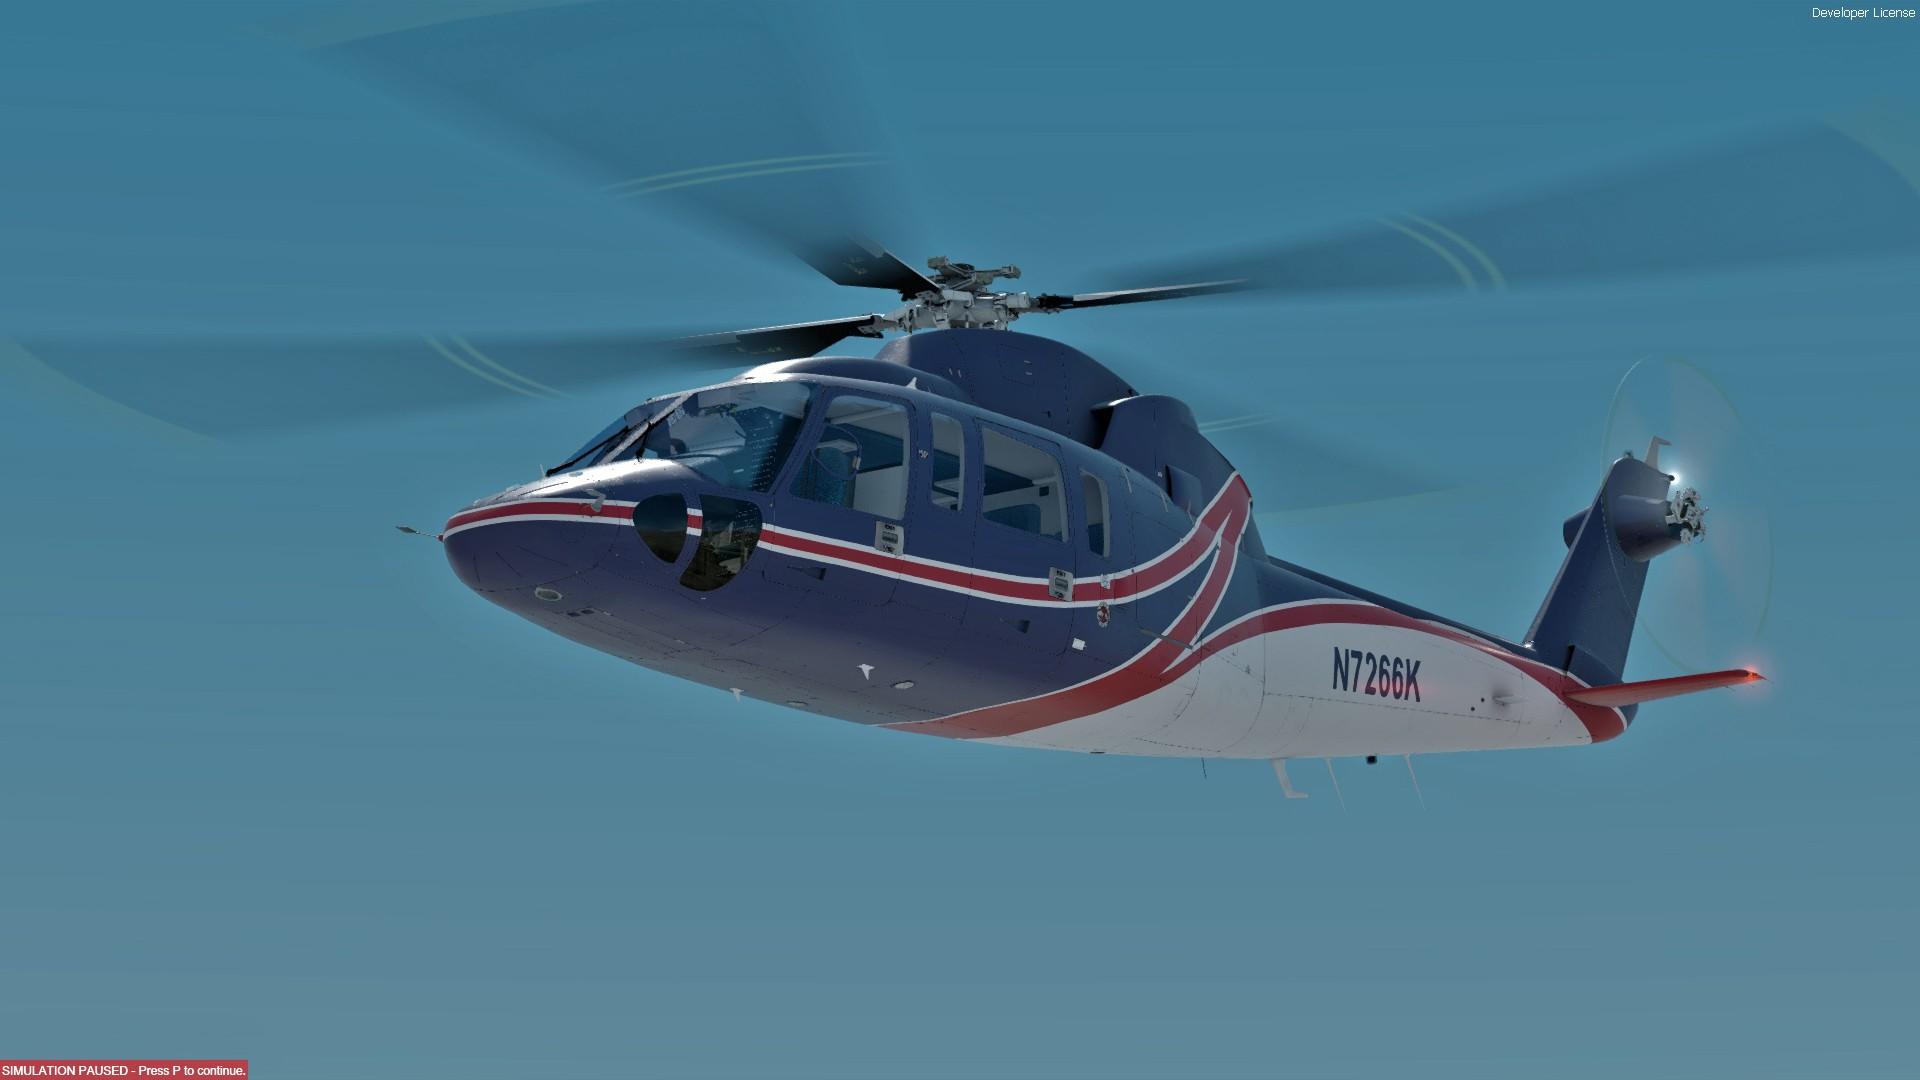 Sikorsky S-76A Spirit